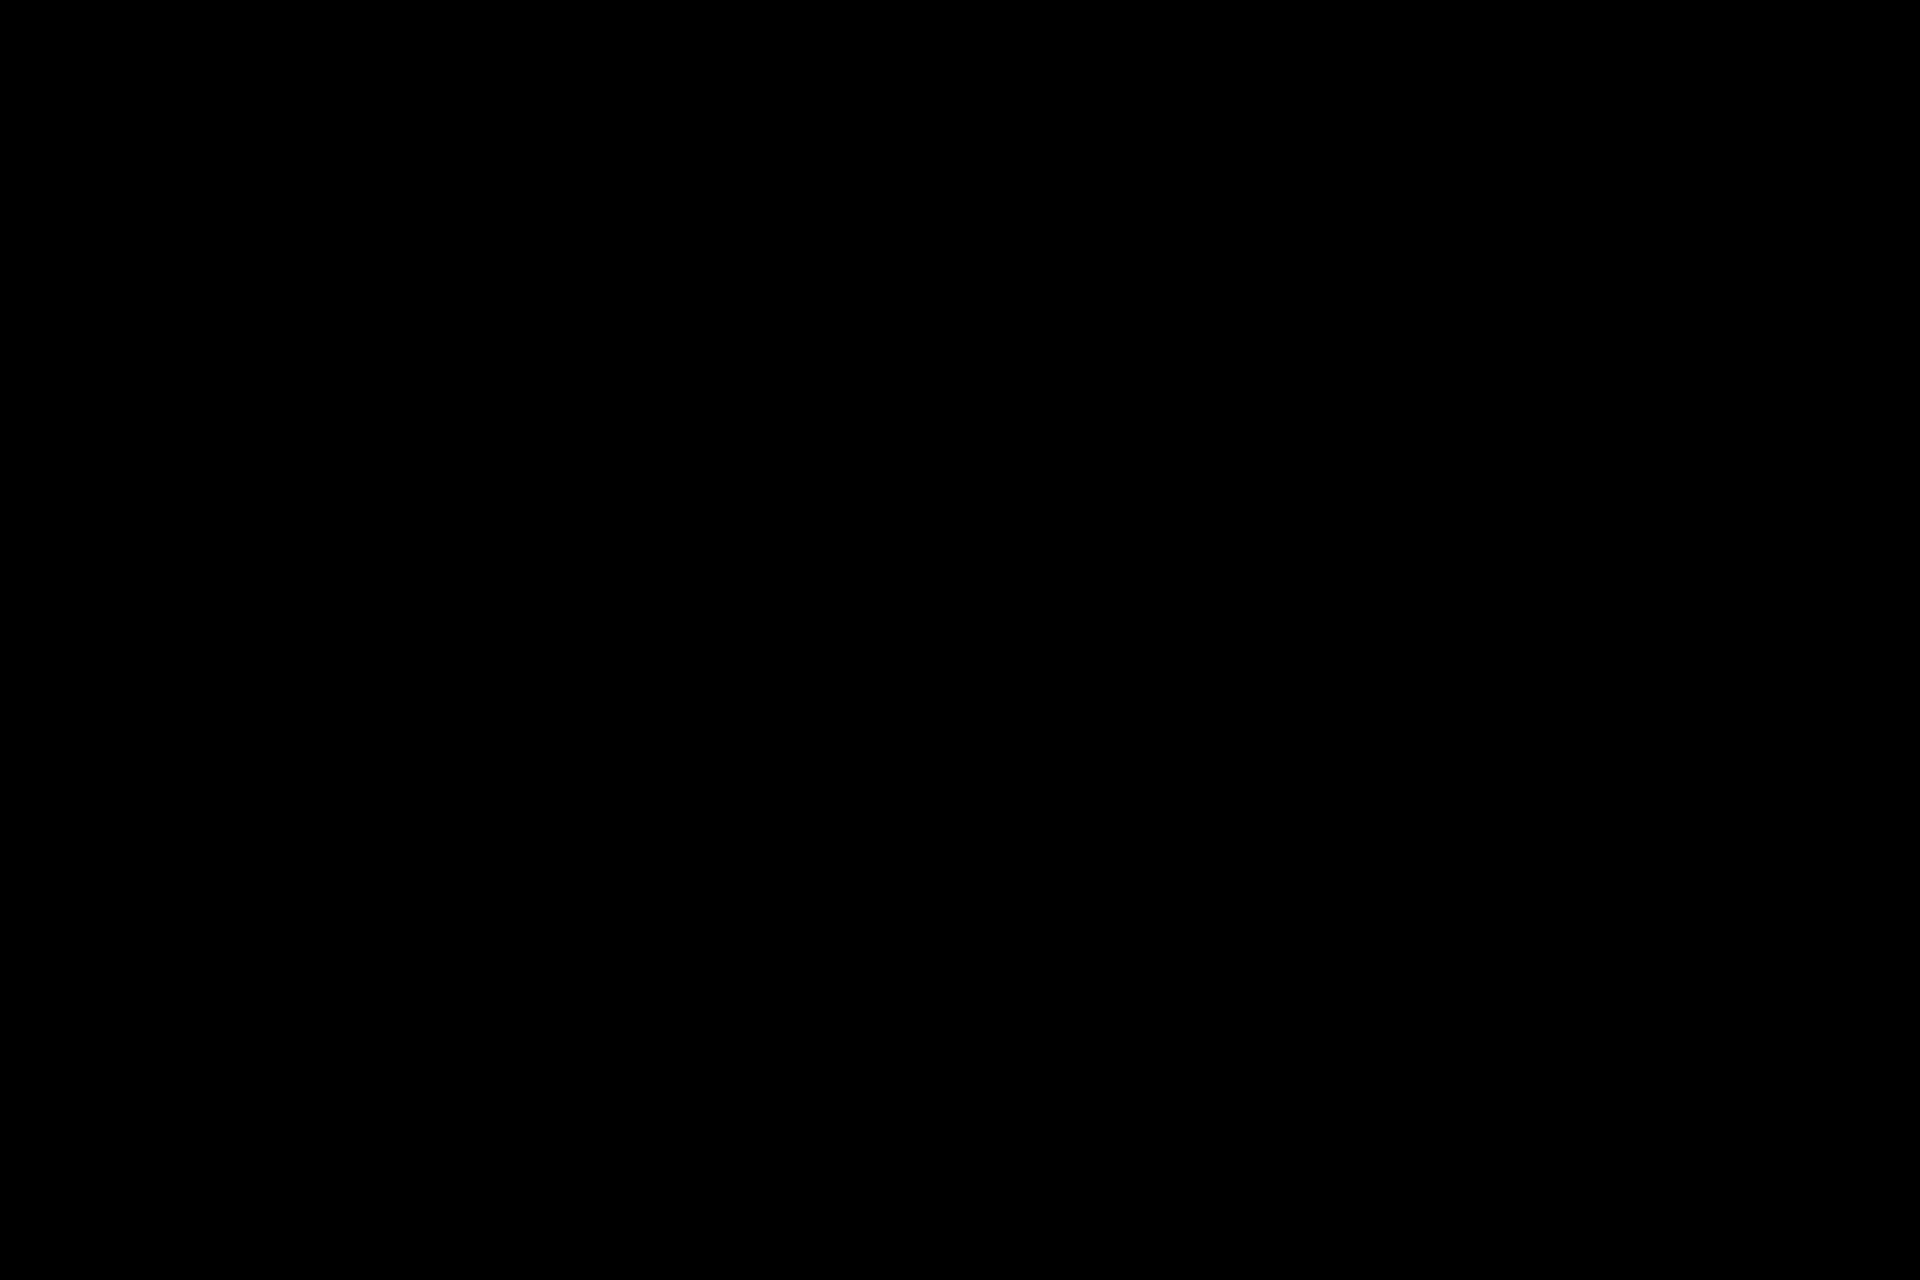 Breitling K11 Musea